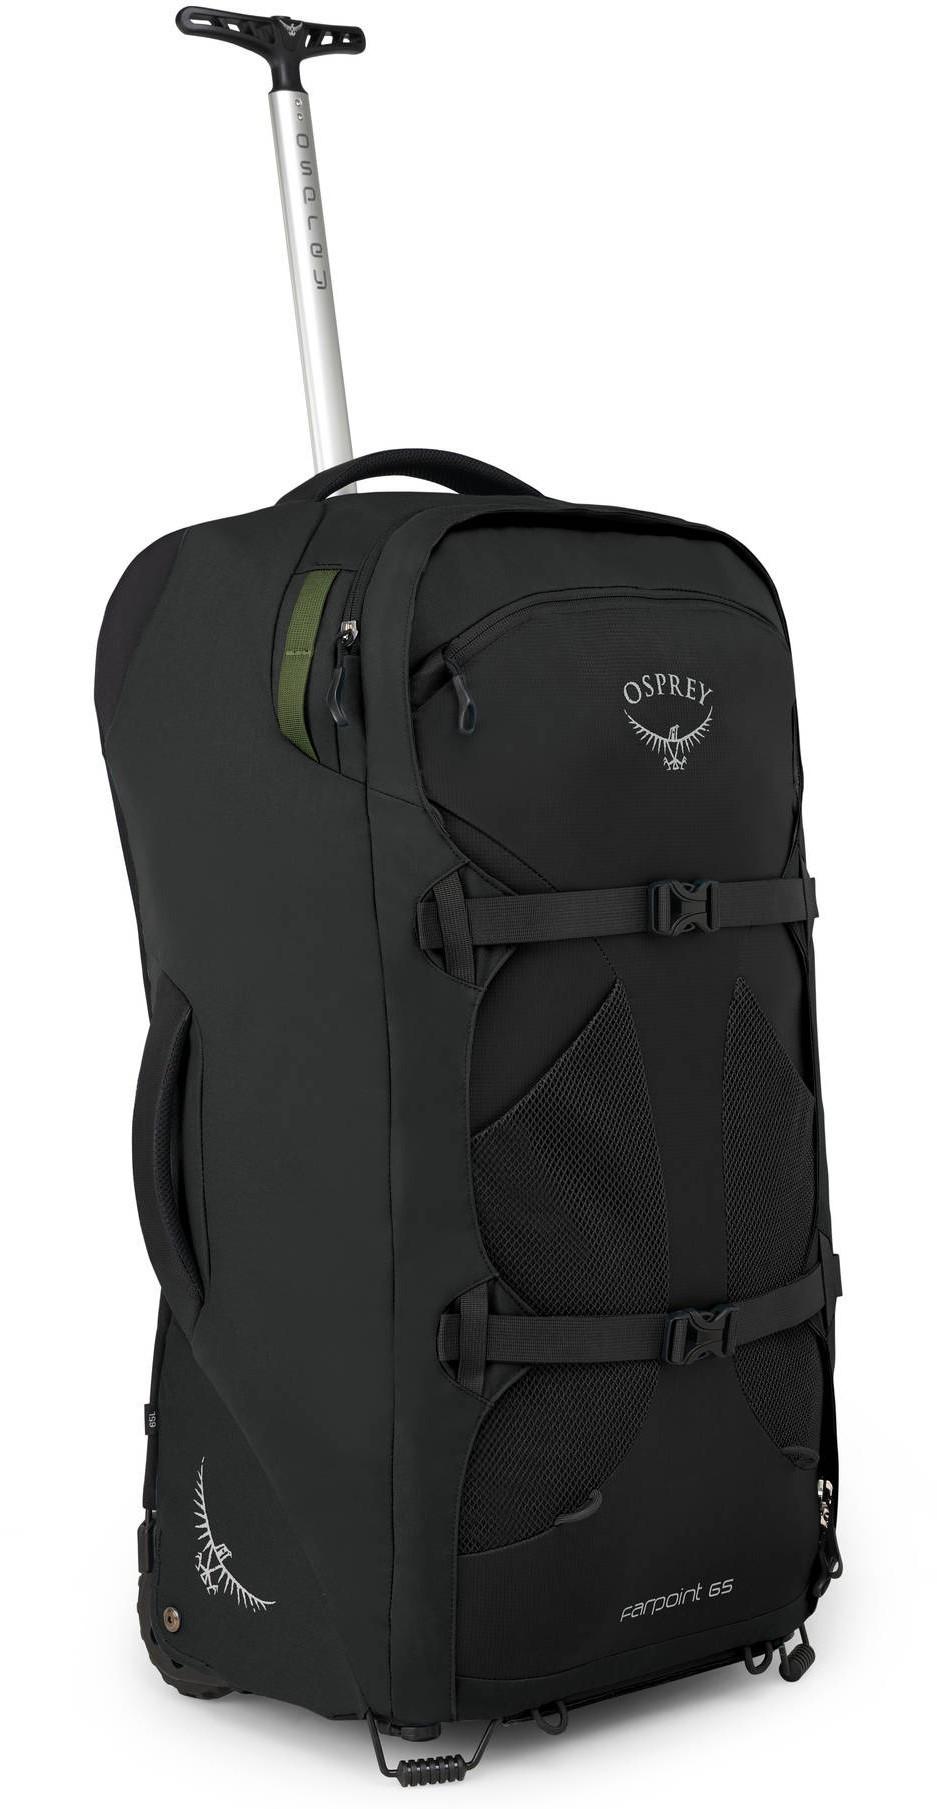 Сумки на колесах Сумка-рюкзак на колесах Osprey Farpoint Wheels 65 Black Farpoint_Wheels_65_F19_Side_Black_web.jpg